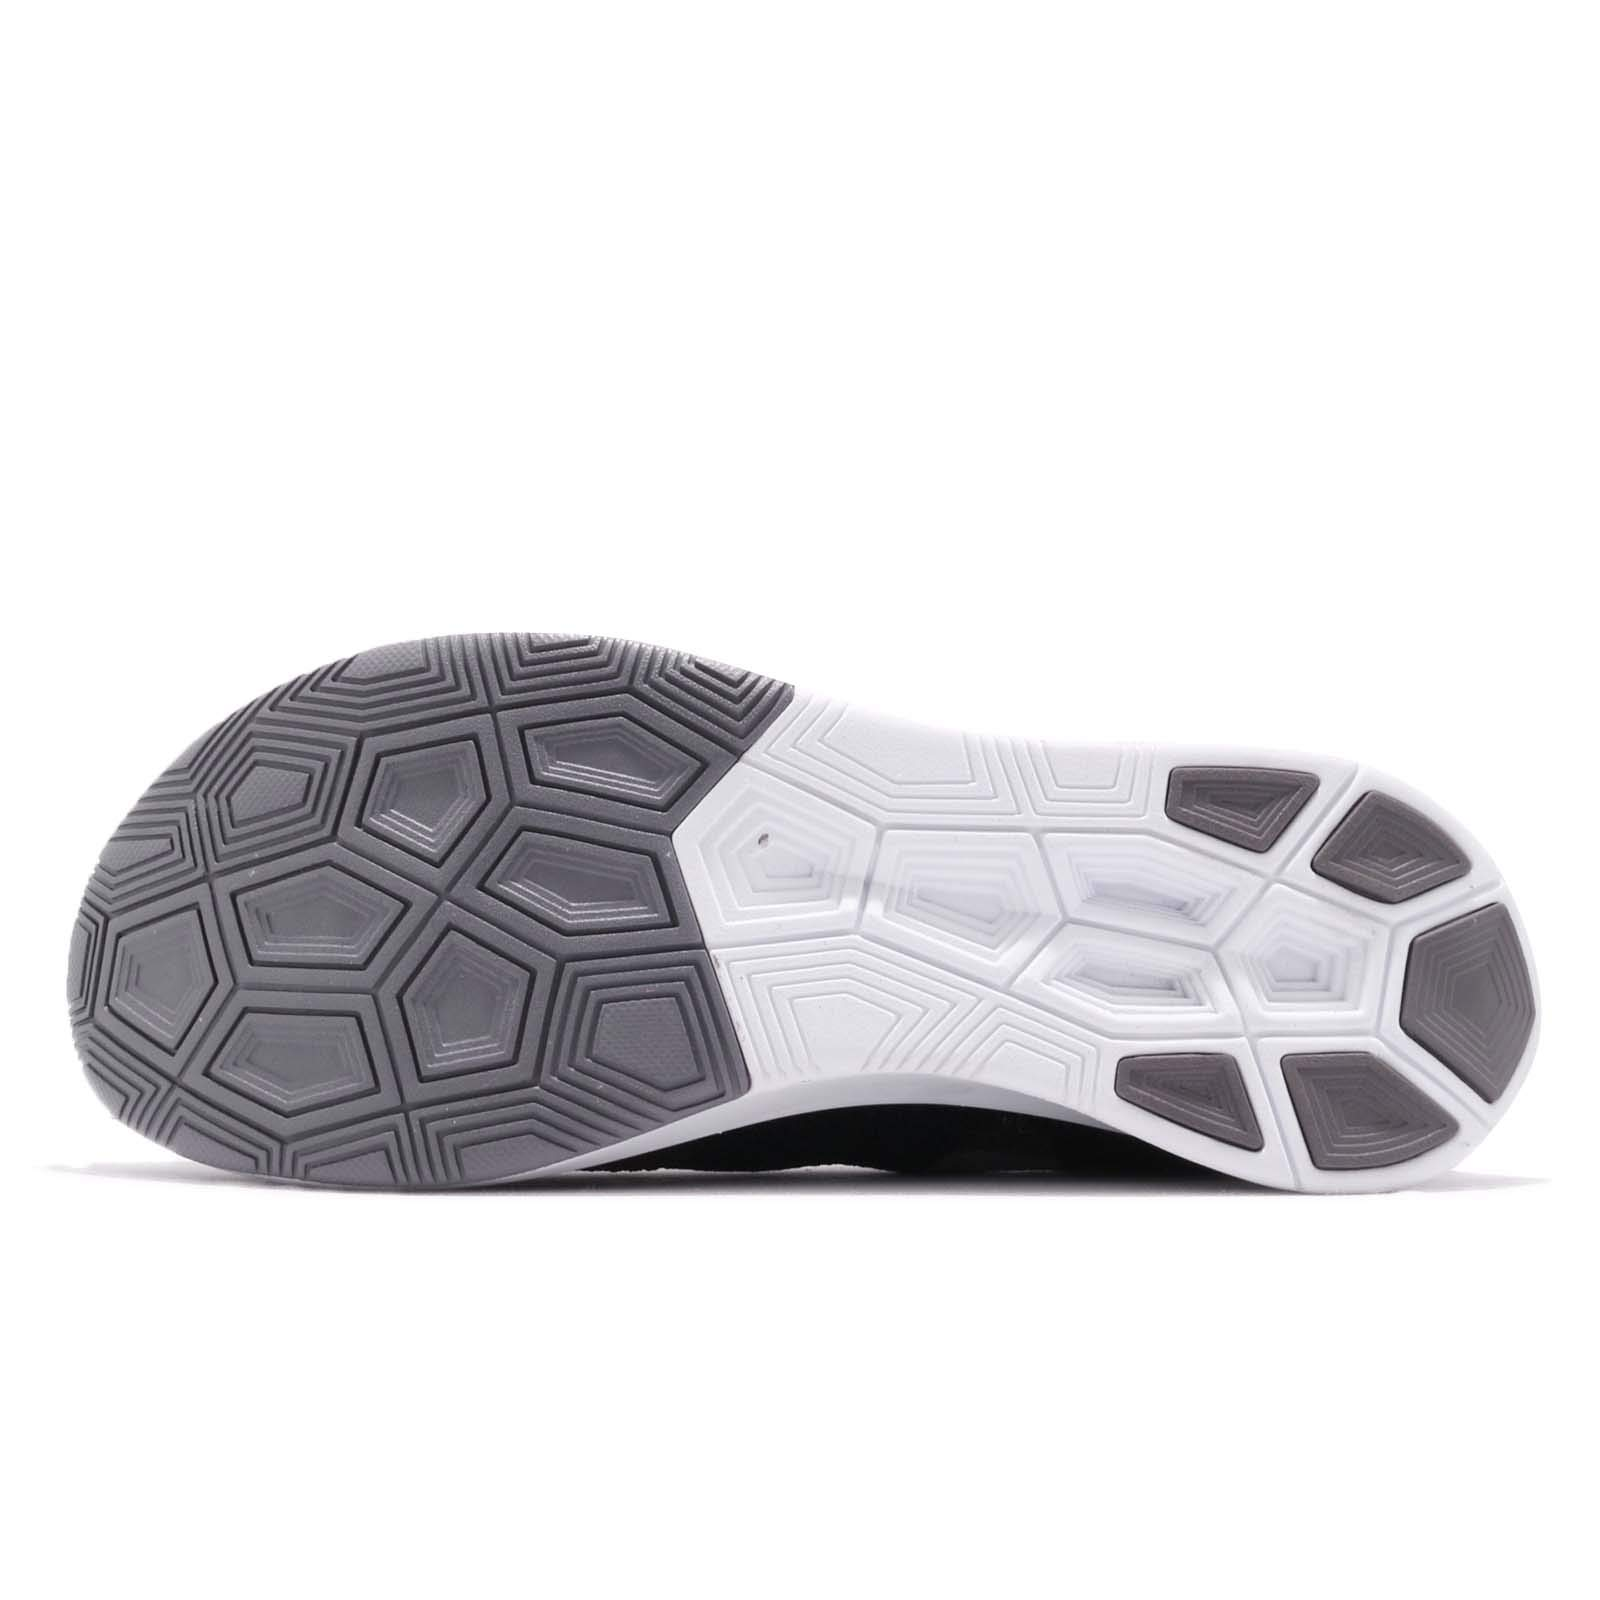 Nike Zoom Fly Flyknit Men's Running Shoe Black/Gunsmoke-White Size 7.5 by Nike (Image #4)